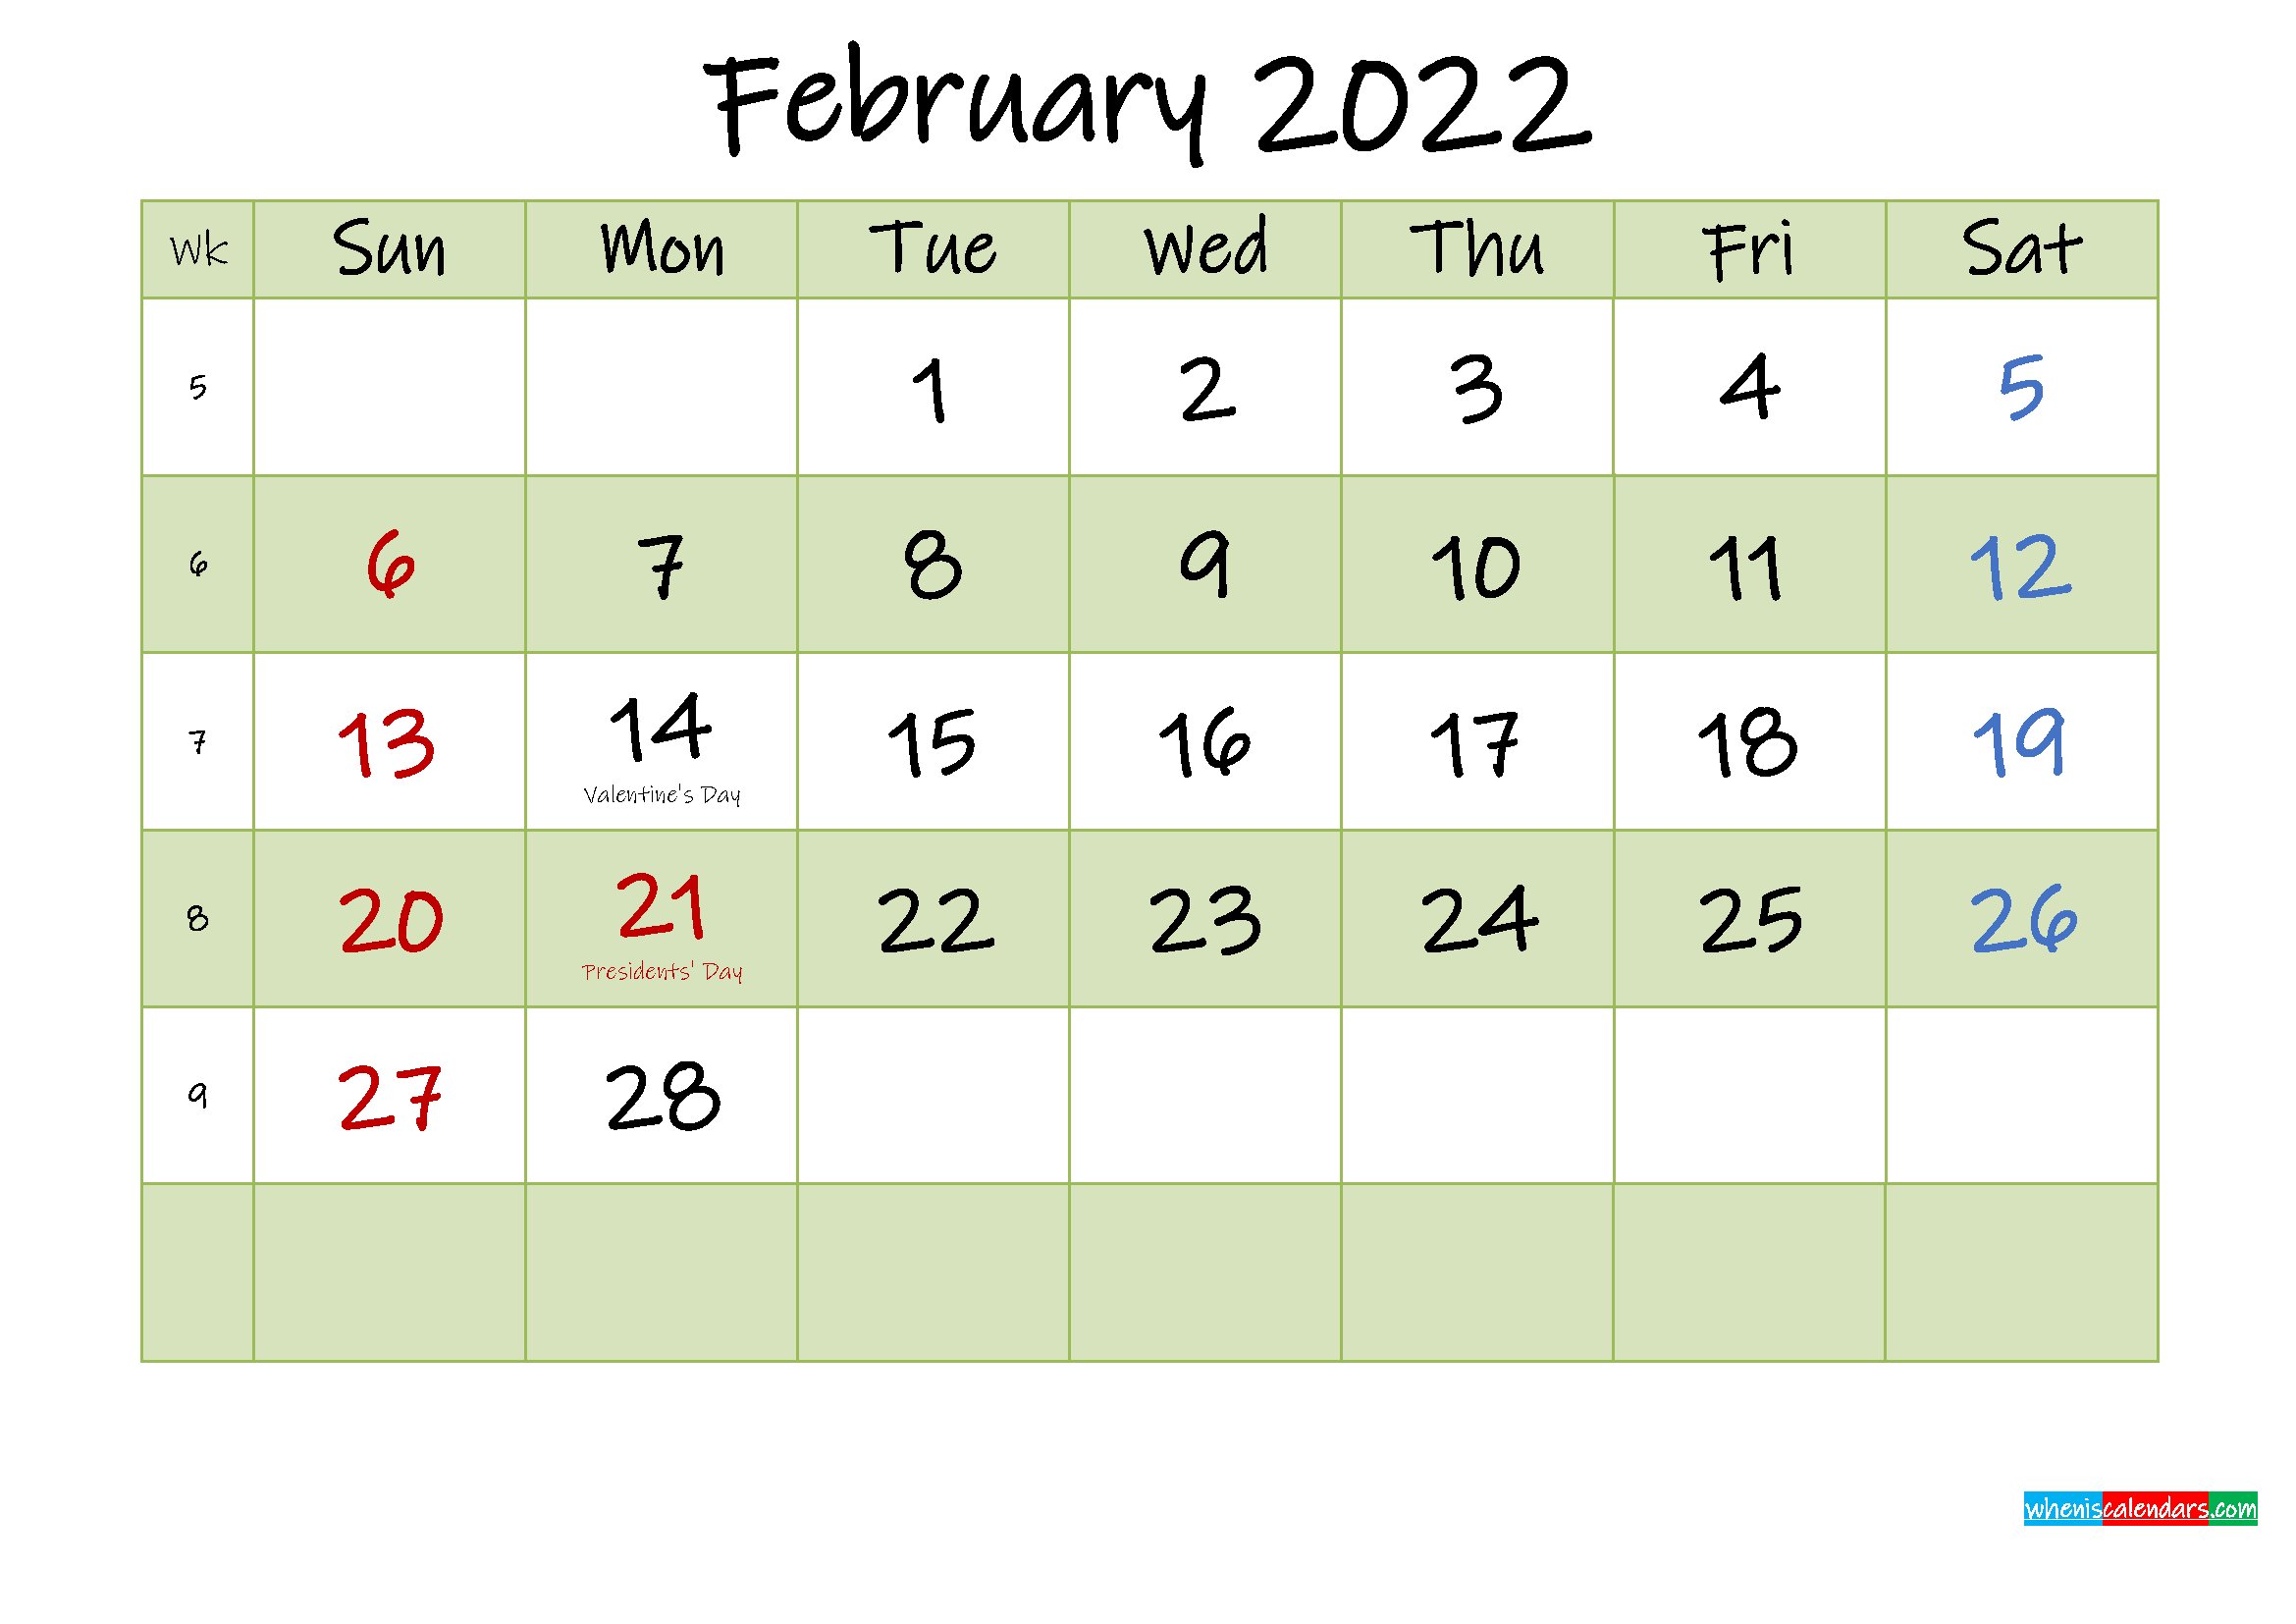 February 2022 Calendar with Holidays Printable - Template ...